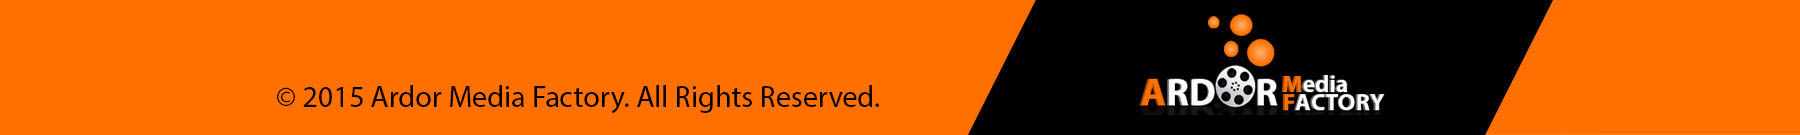 amf-orange footer